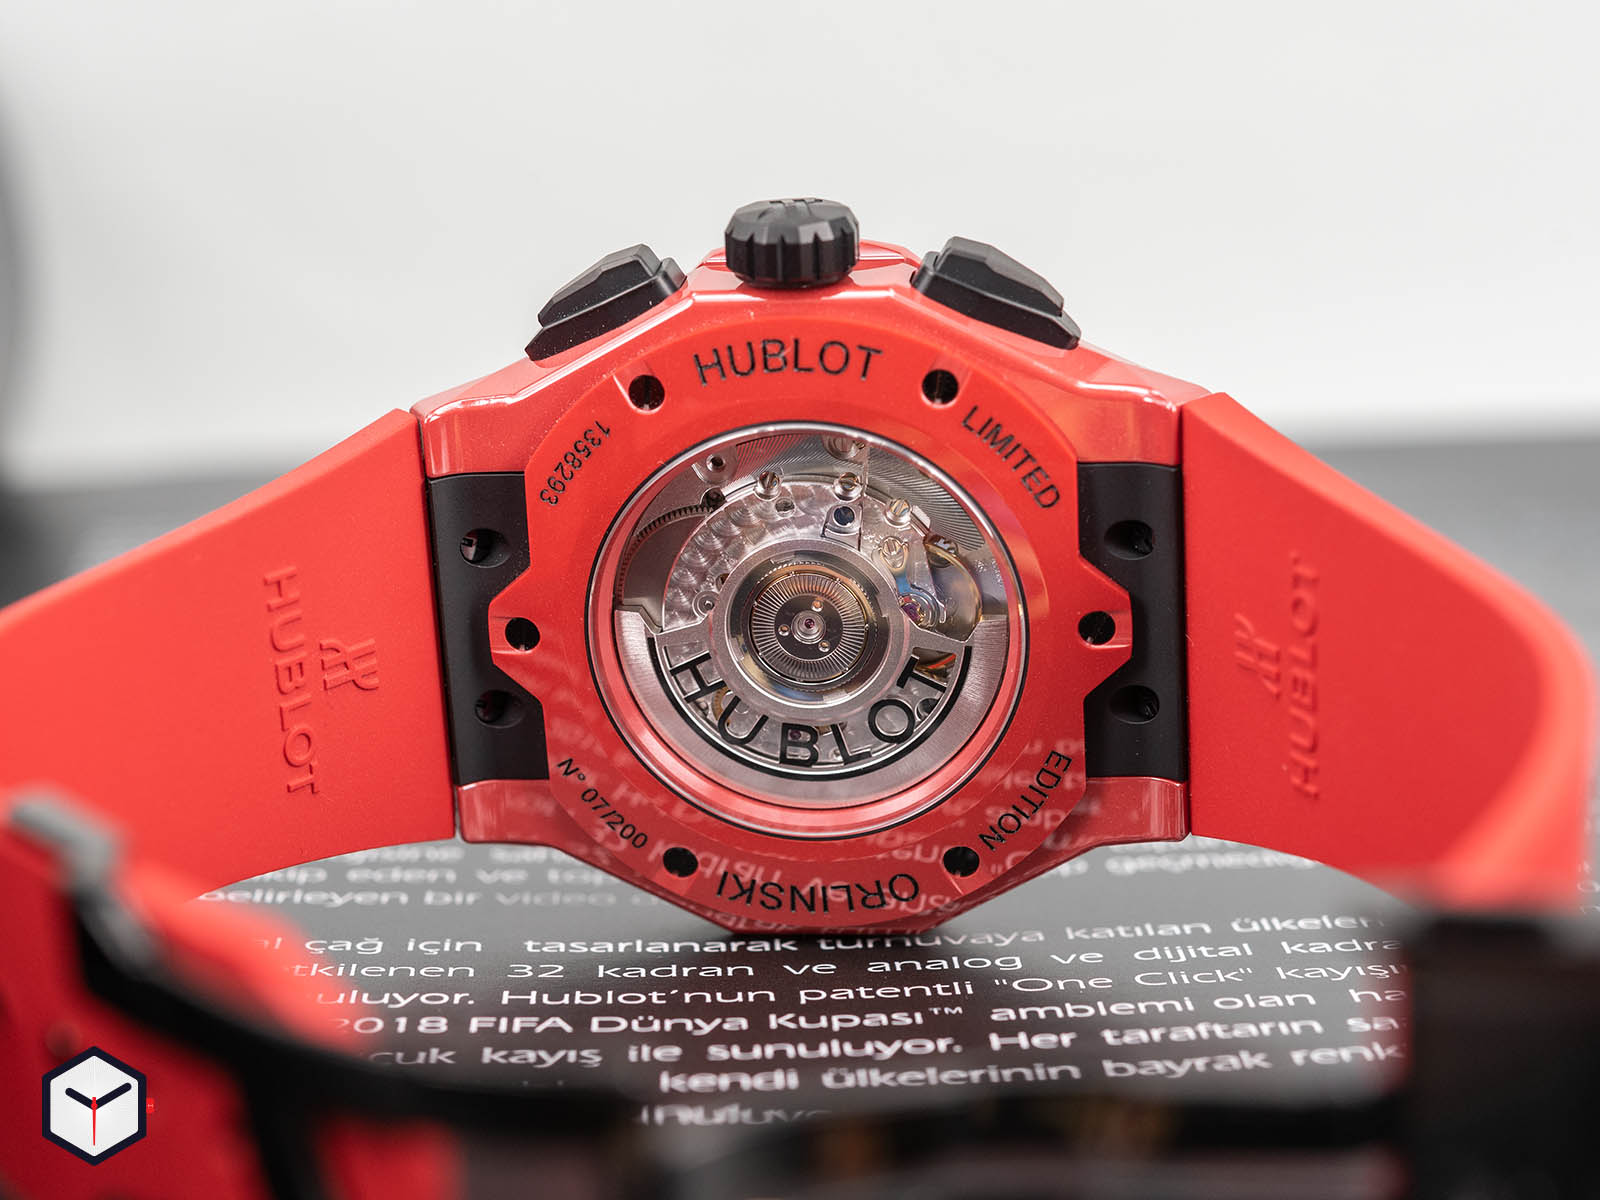 525-cf-0130-rx-orl19-hublot-classic-fusion-chronograph-orlinski-red-ceramic-6.jpg